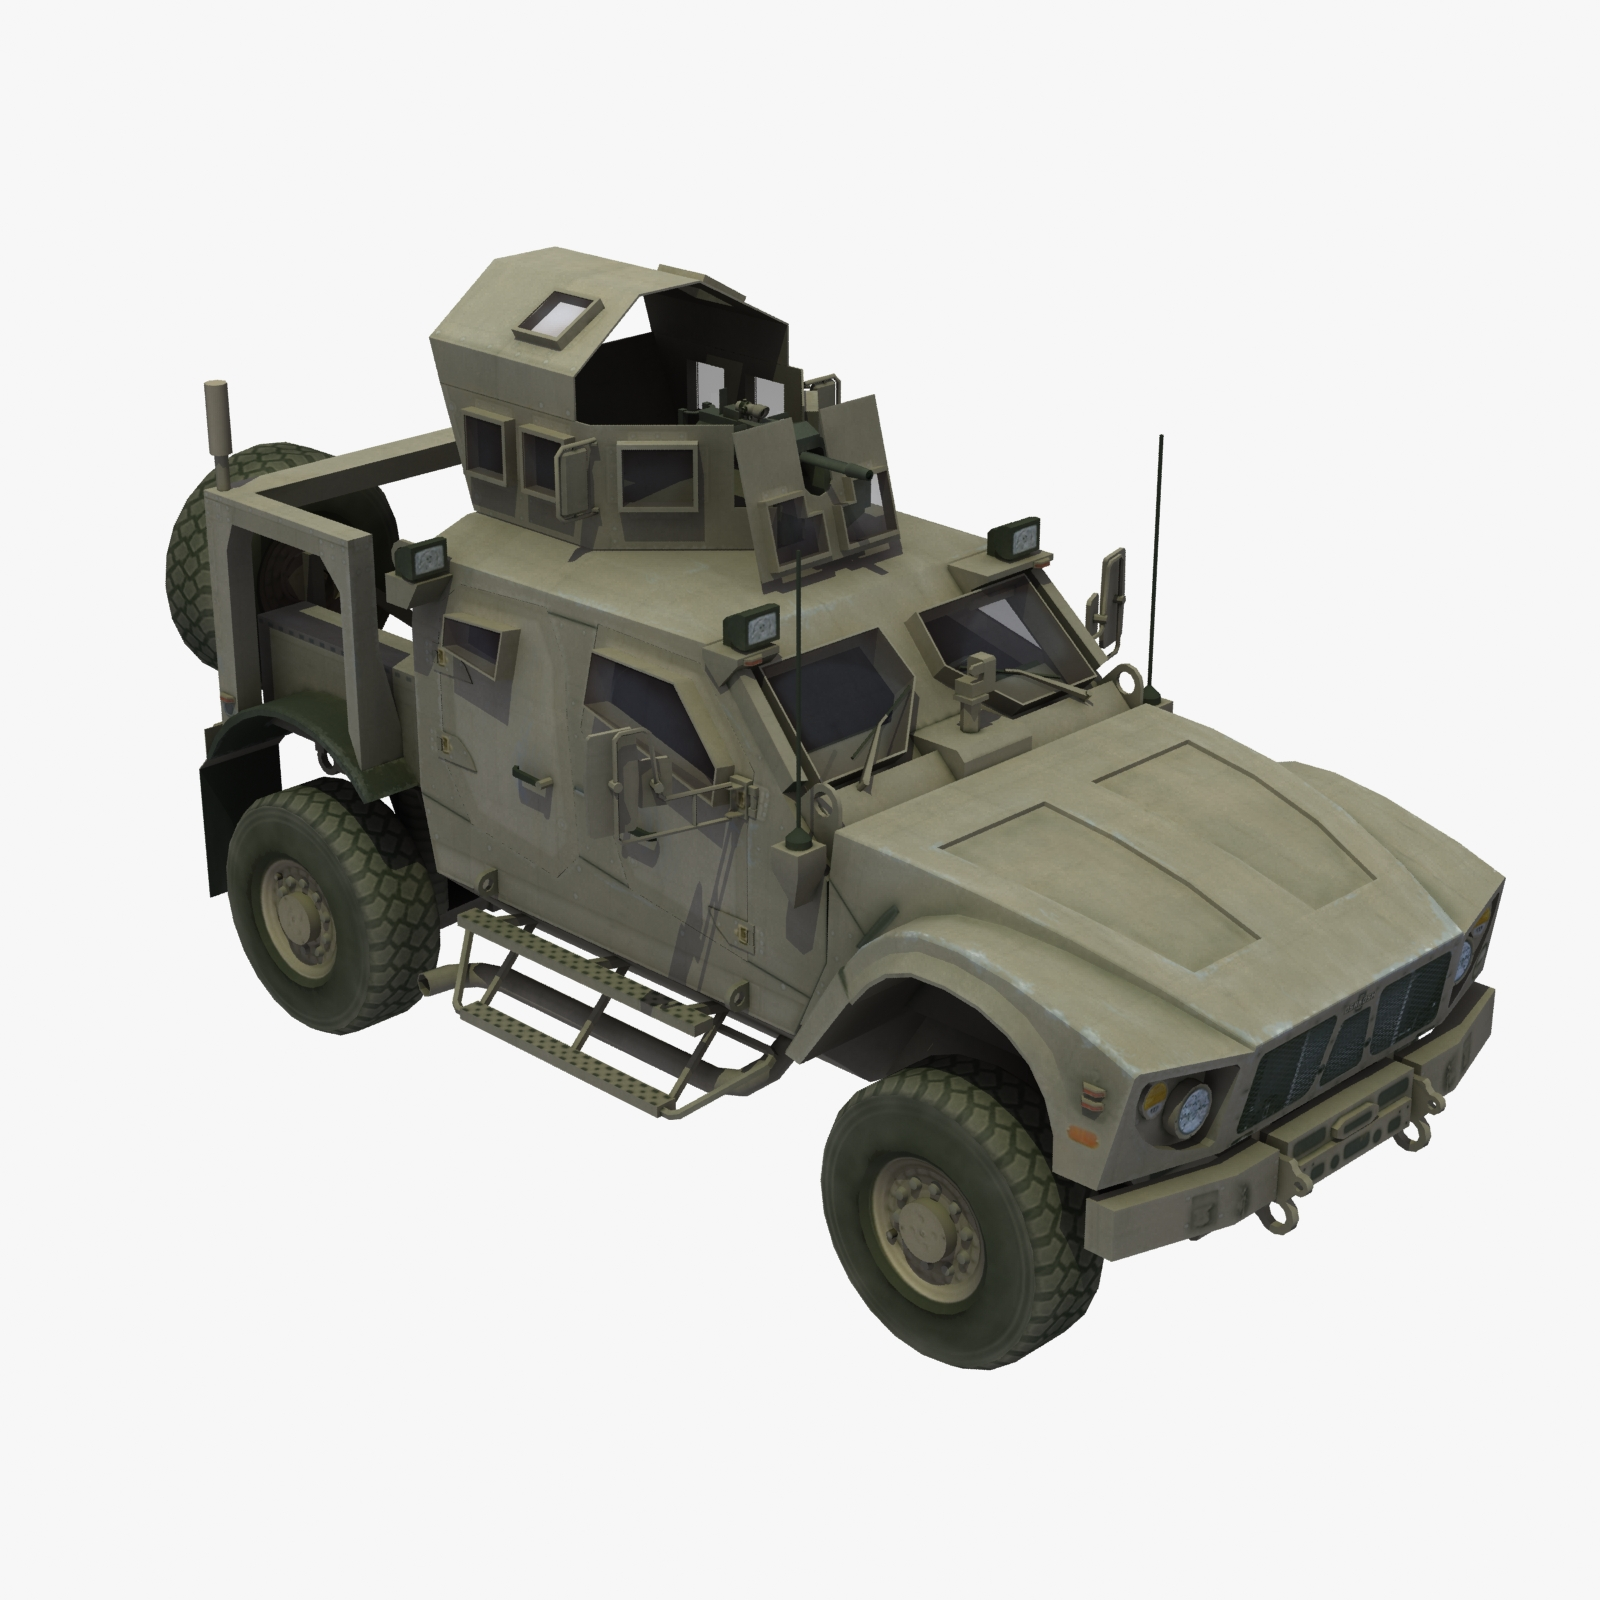 MATV MRAP Truck 3D Model Max Obj 3ds Lwo Lw Lws Hrc